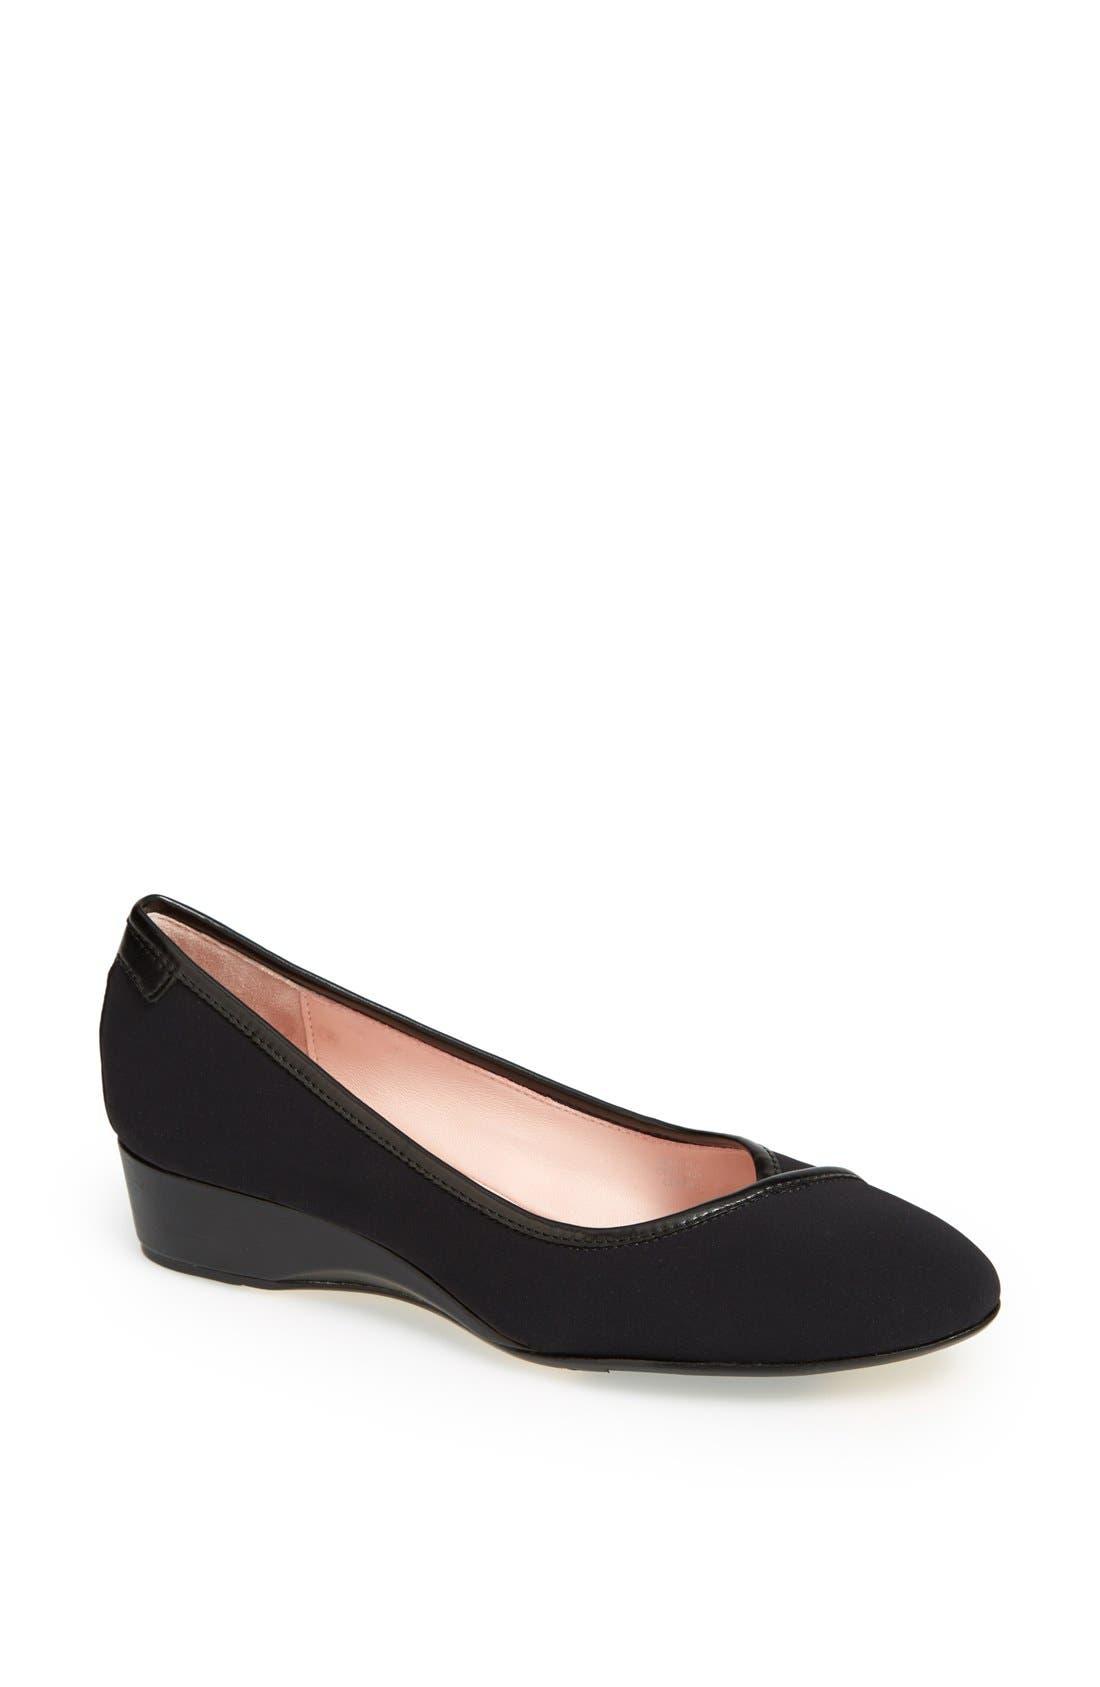 'Felicity' Wedge Slip-On, Main, color, 001